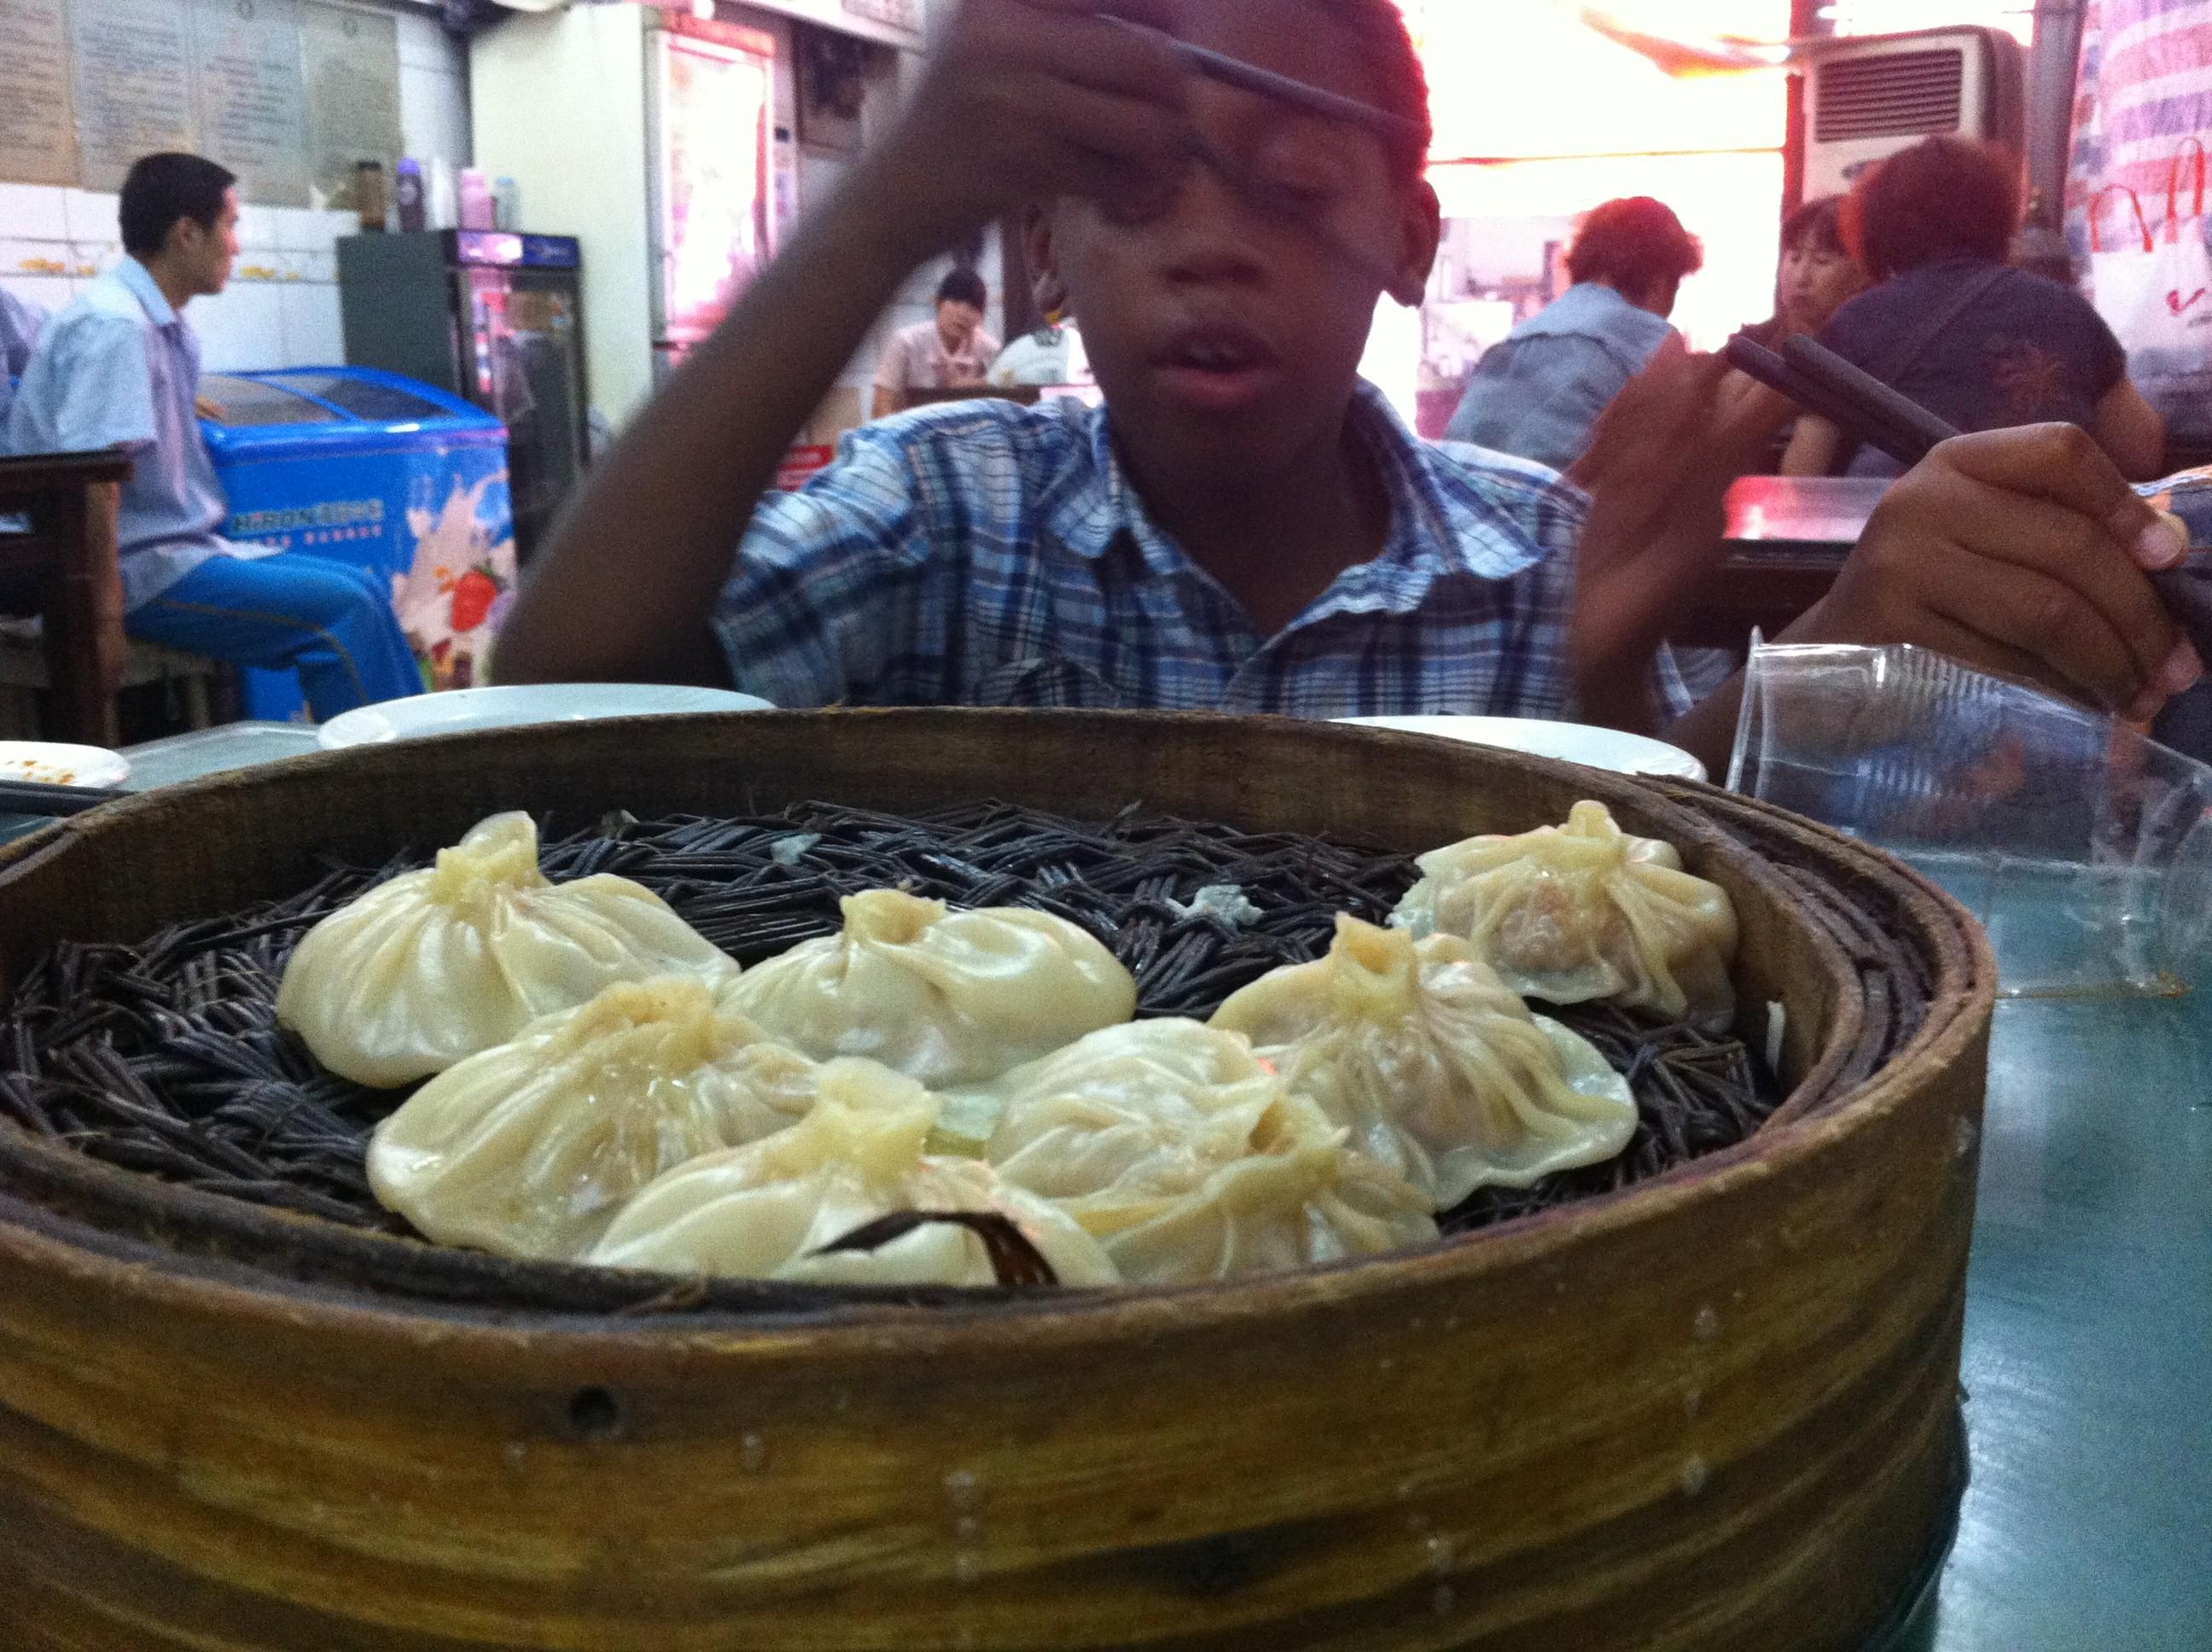 ethan dumpling